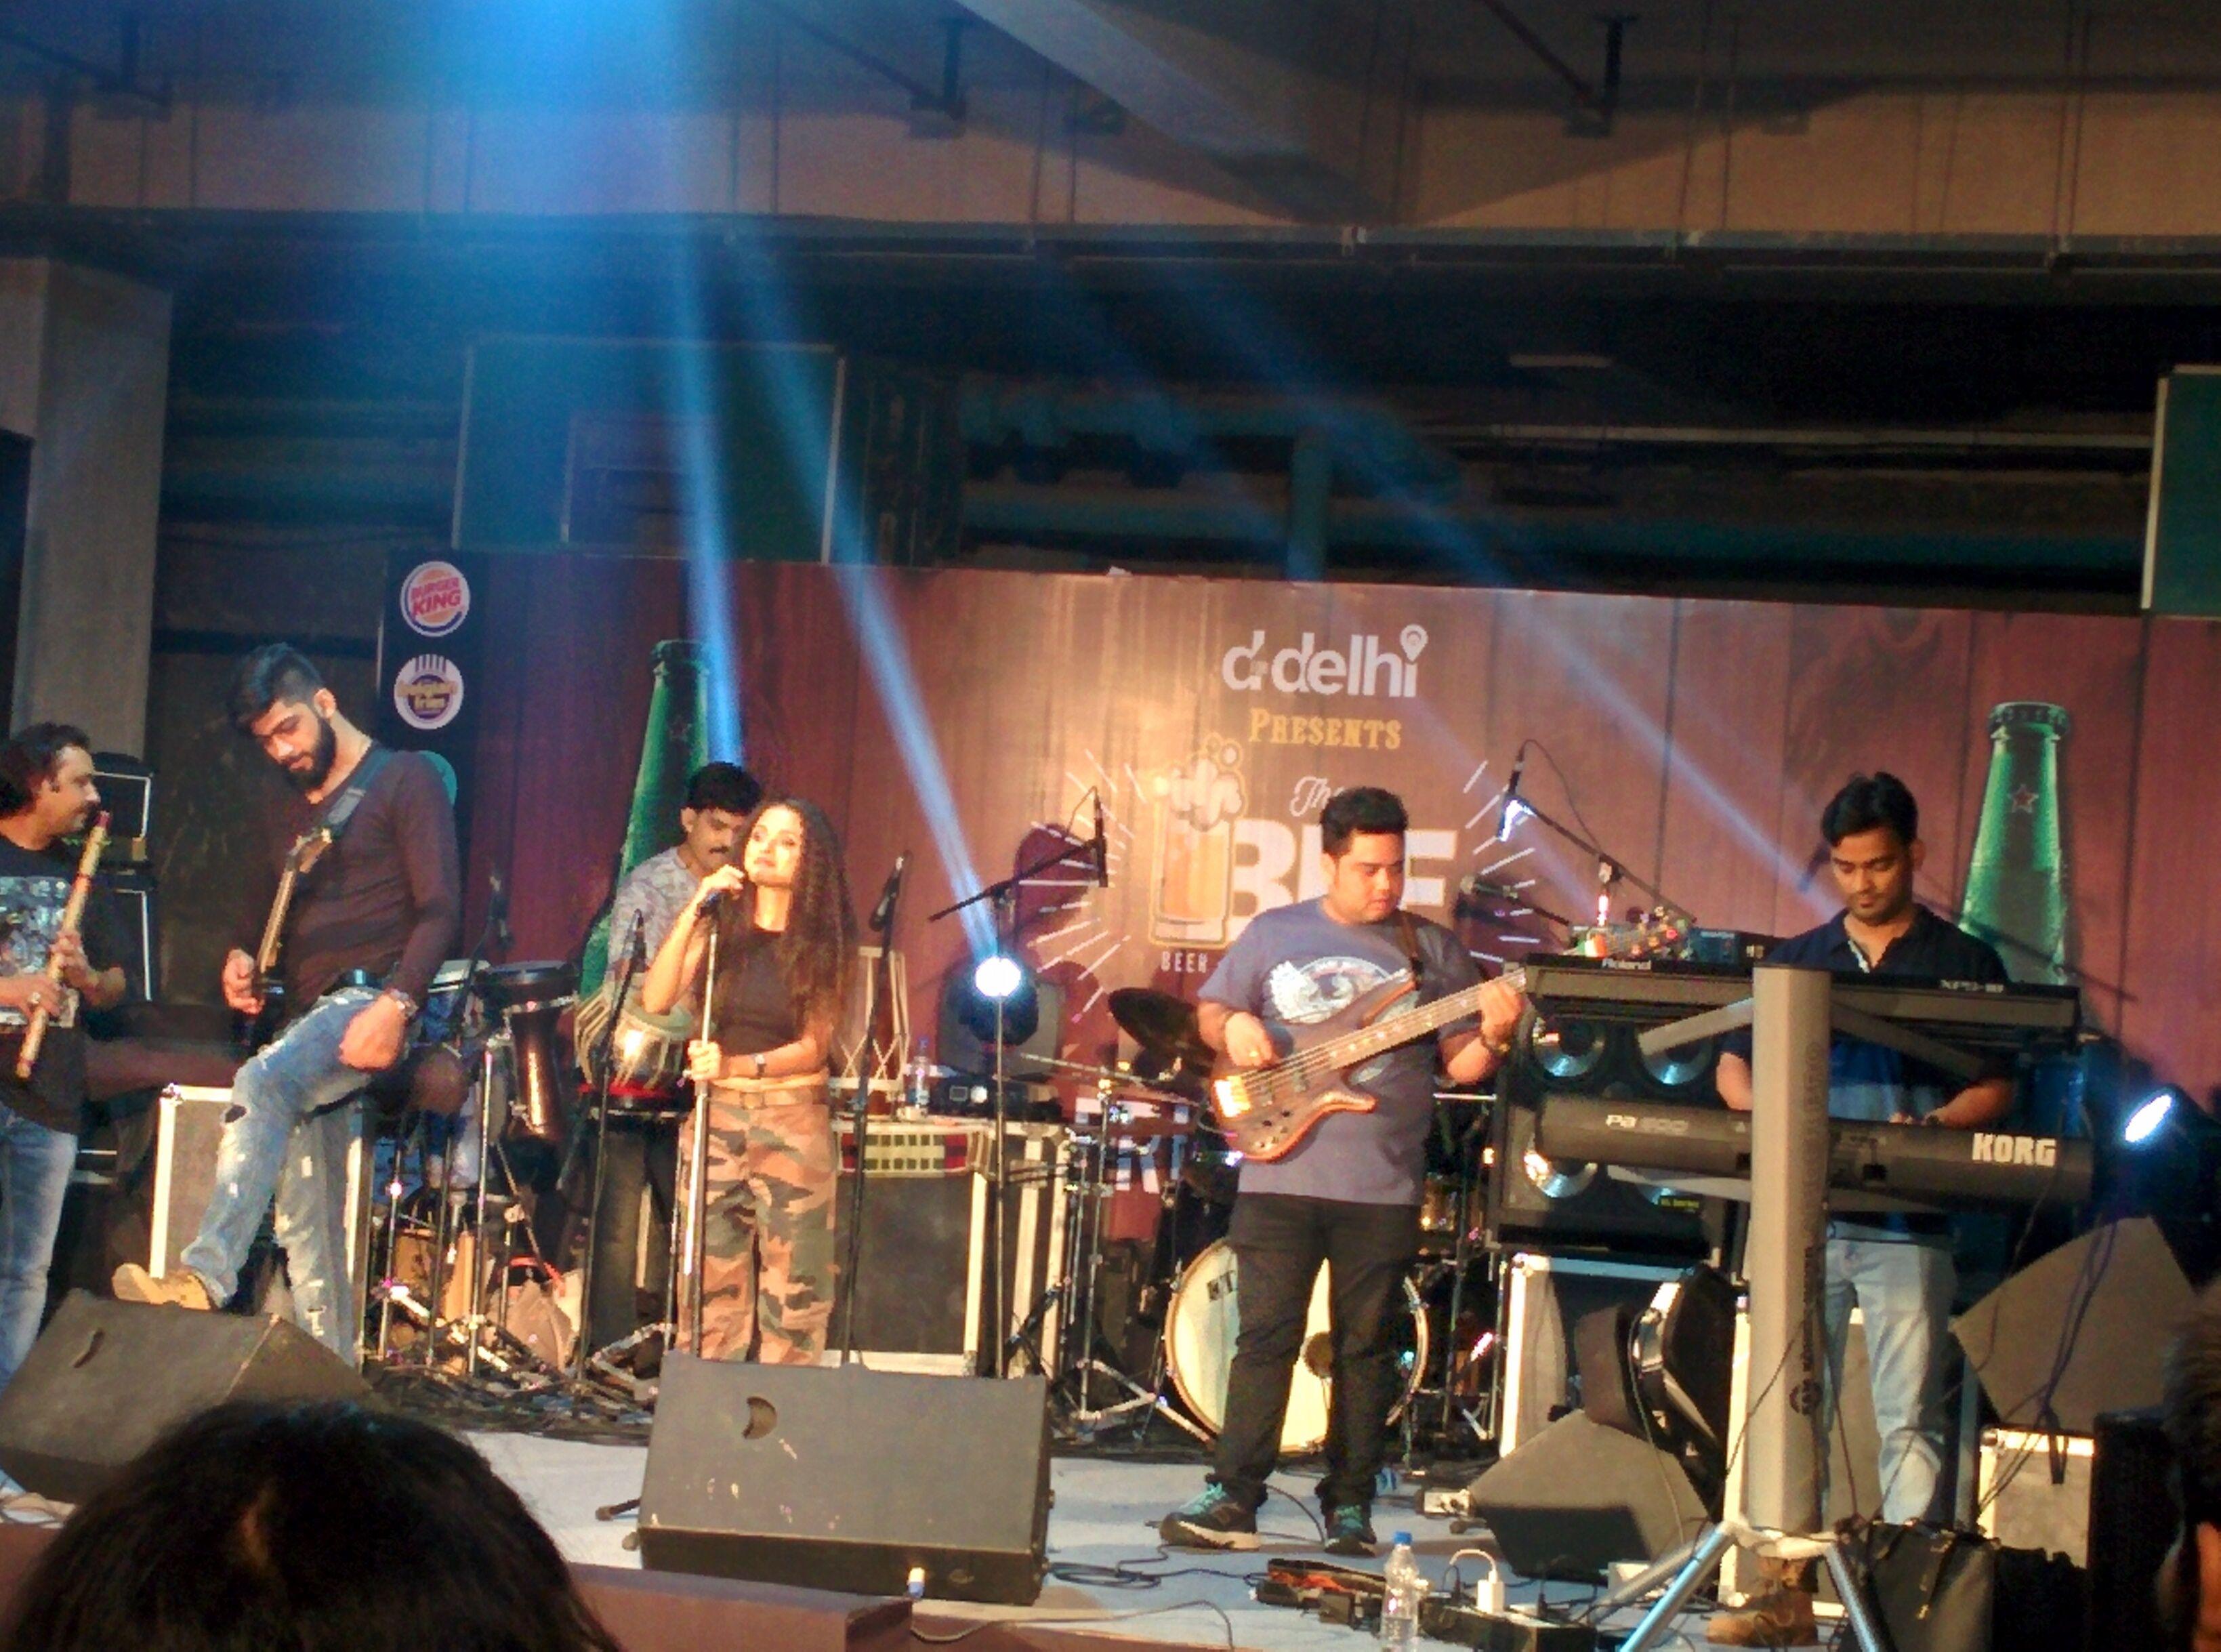 Another rocking show by localturnon band rocknaama